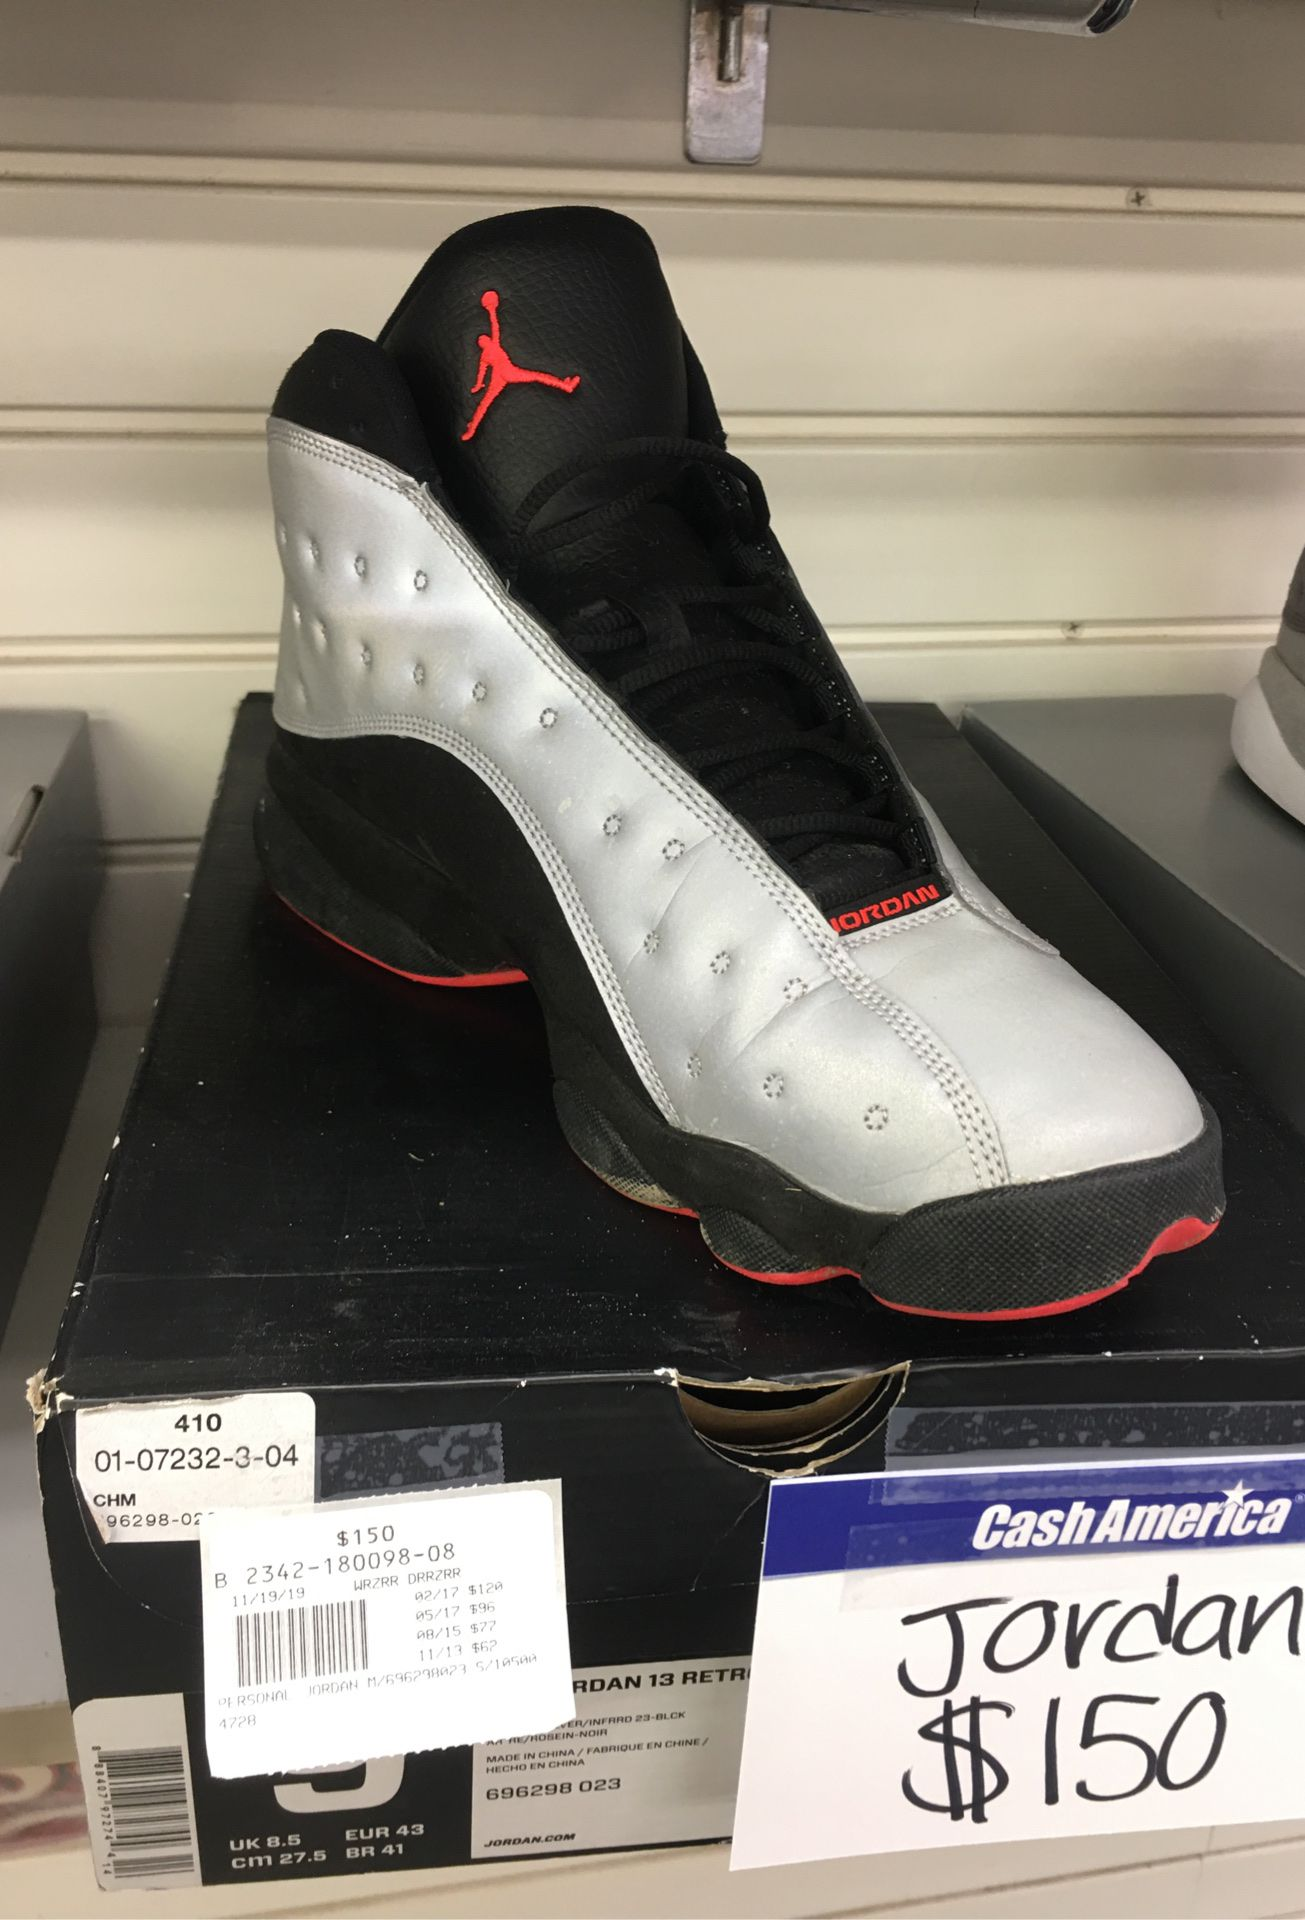 Jordans 9.5